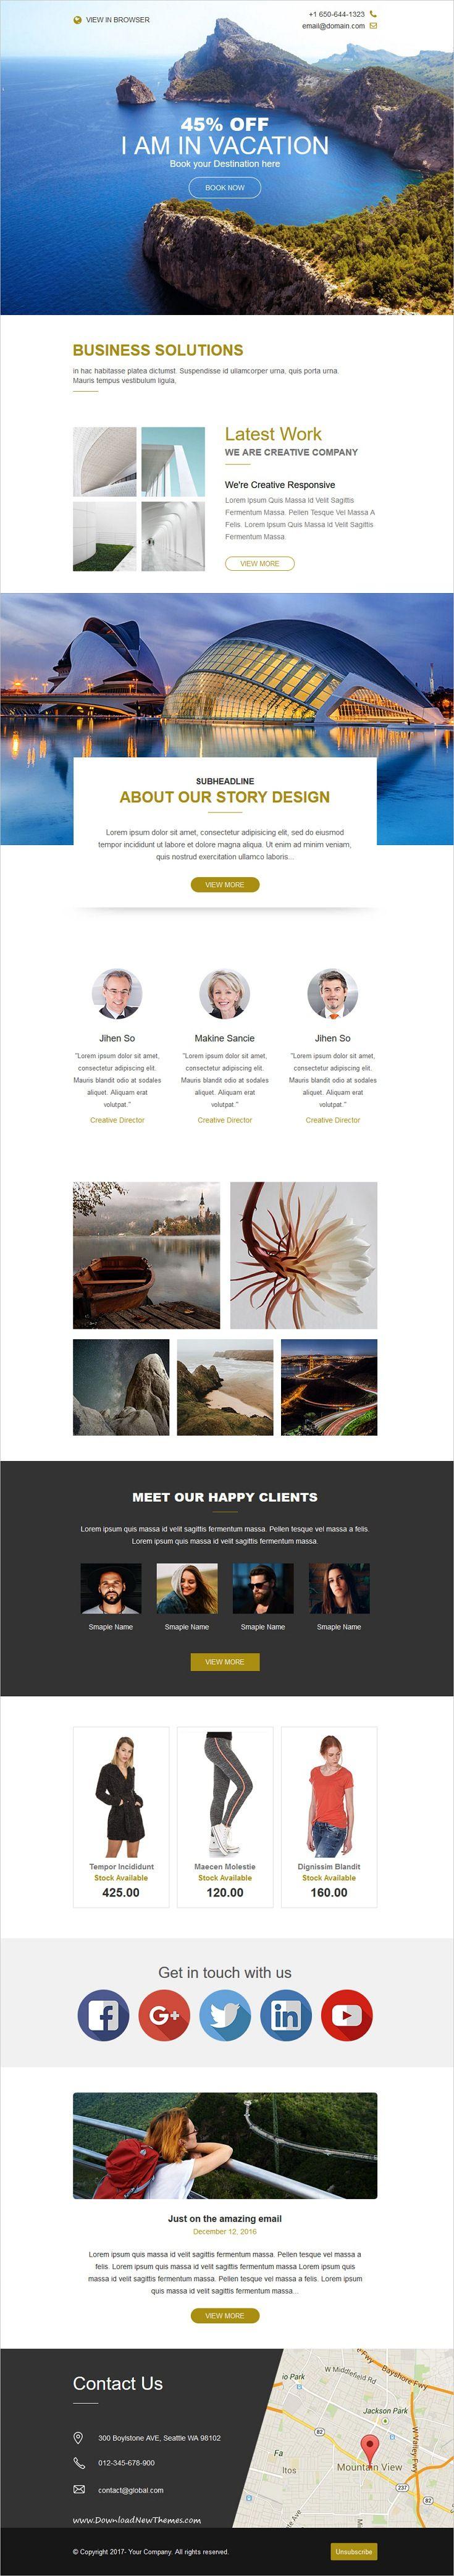 Souvent Best 25+ Email newsletter design ideas on Pinterest | Email design  DE17